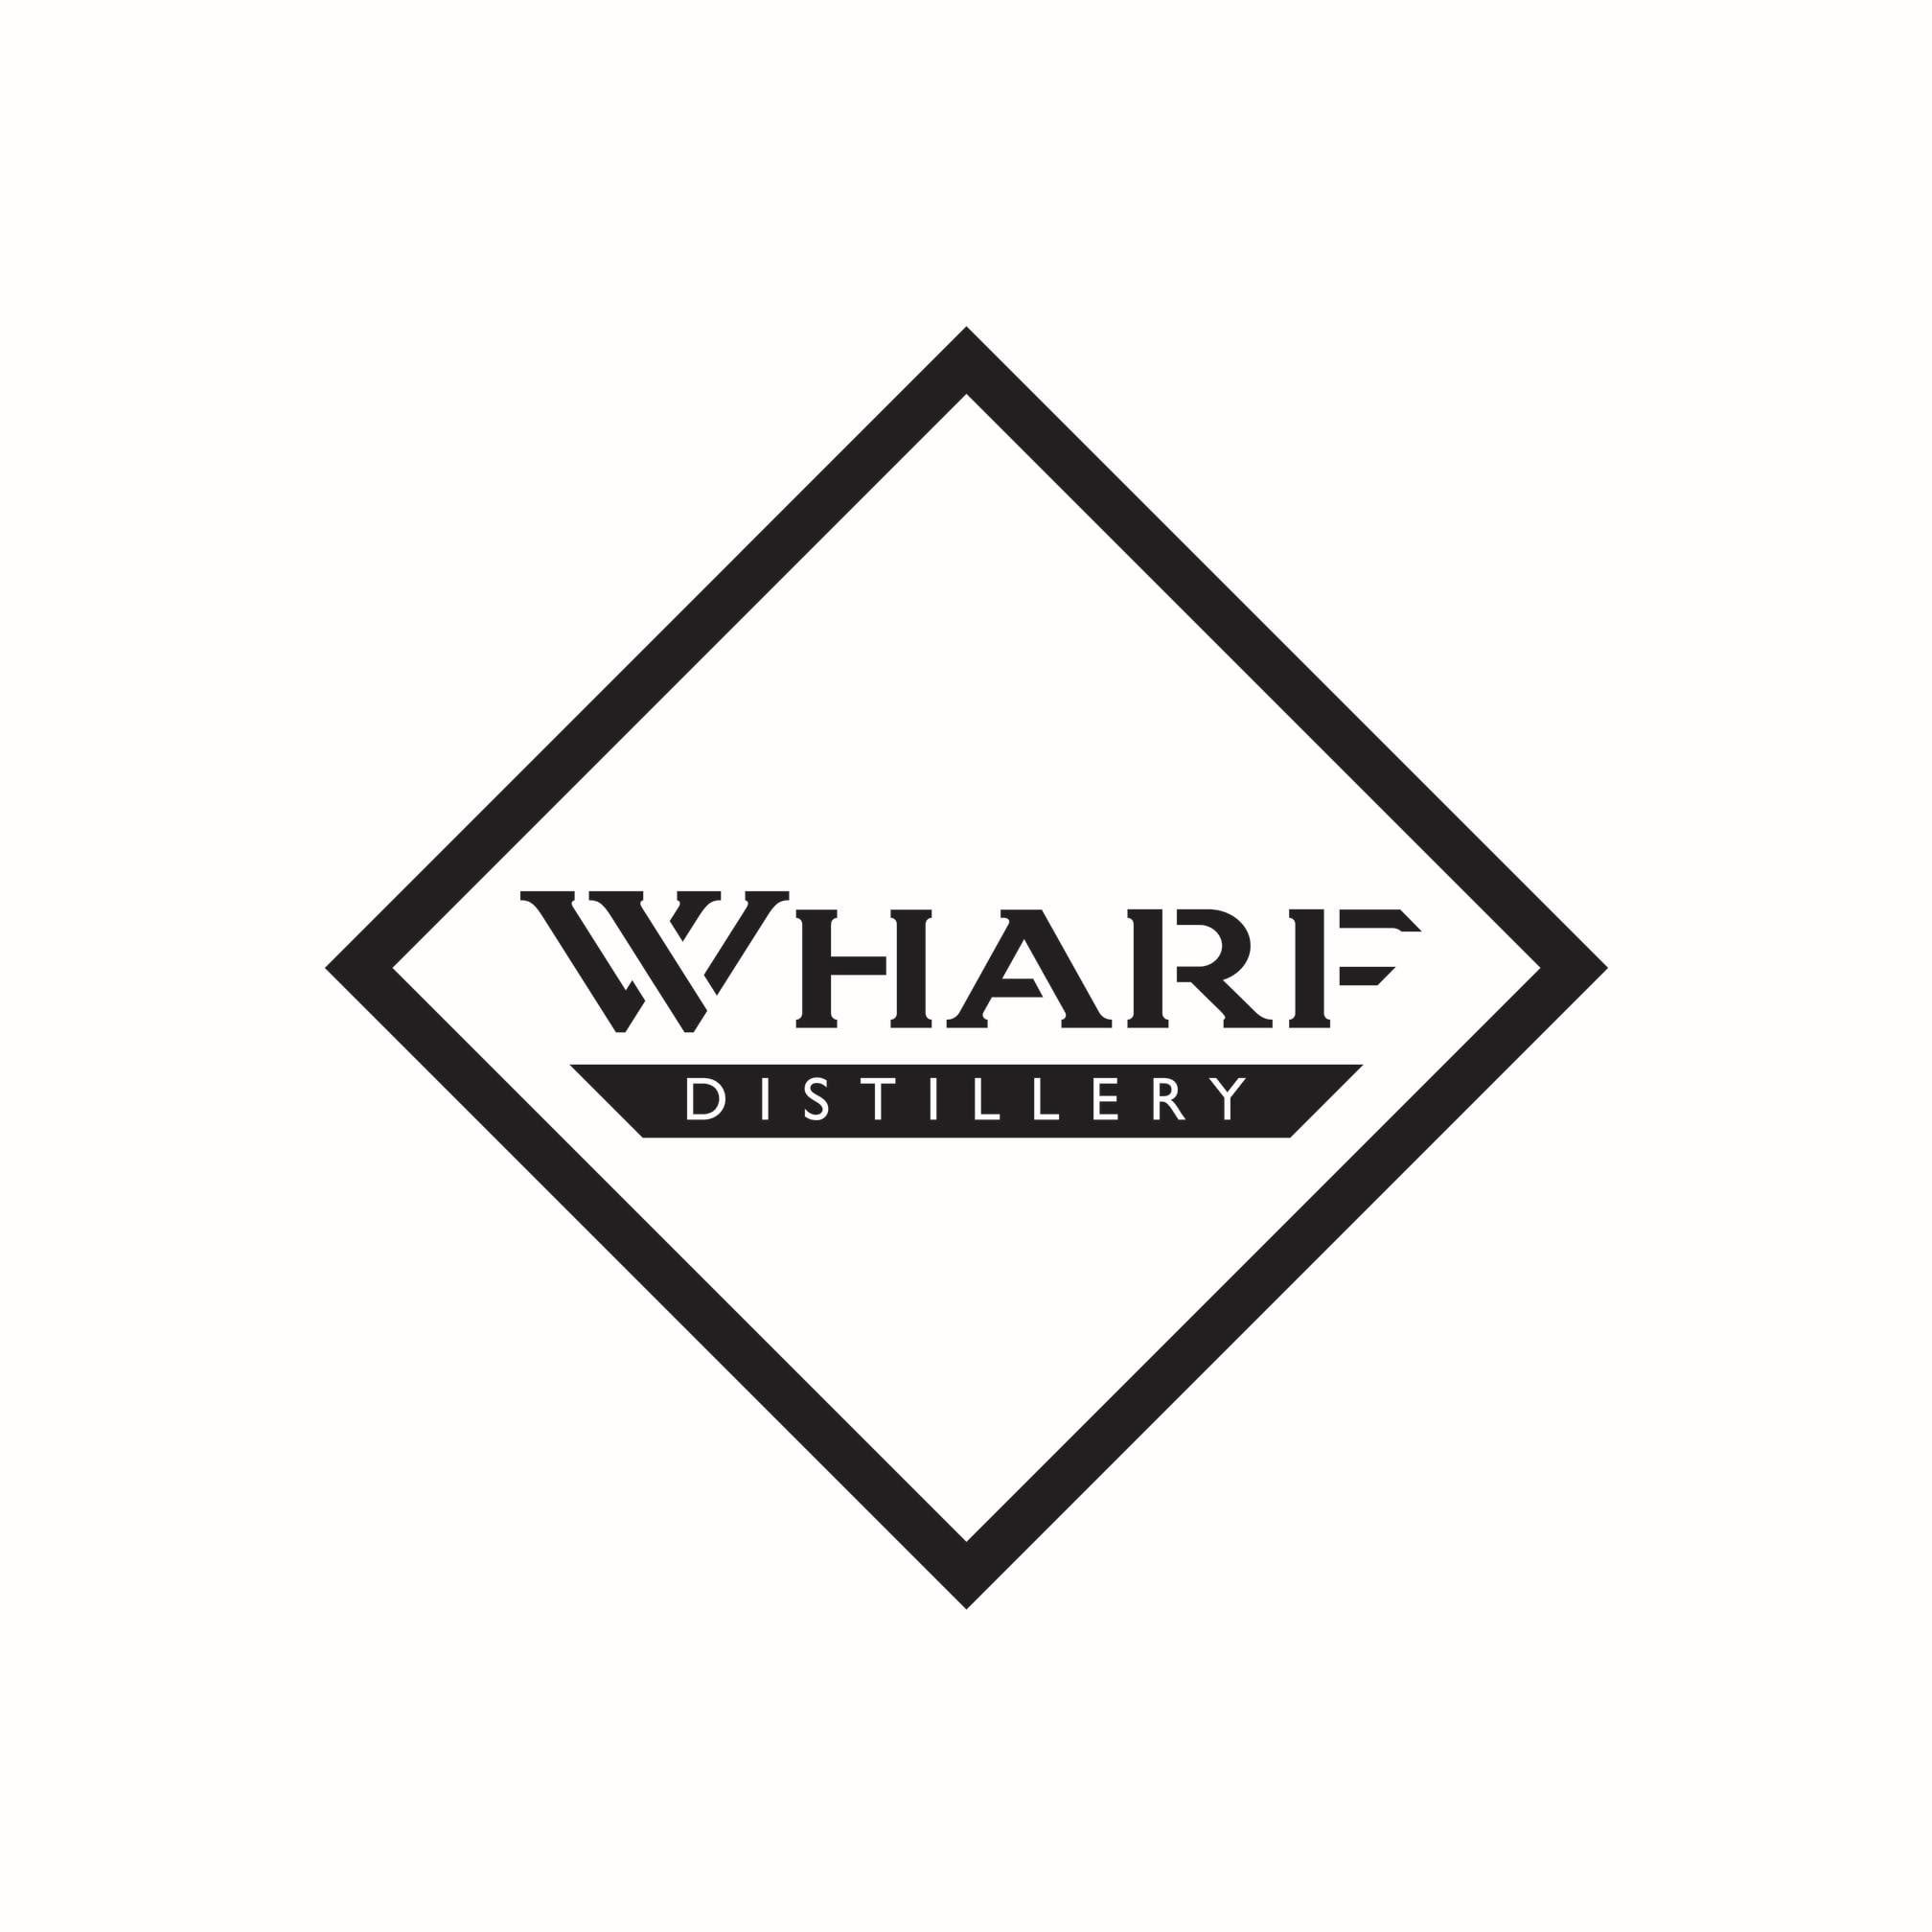 Wharf Distillery - Towcester, Northamptonshire NN12 7QN - 01908 543344 | ShowMeLocal.com